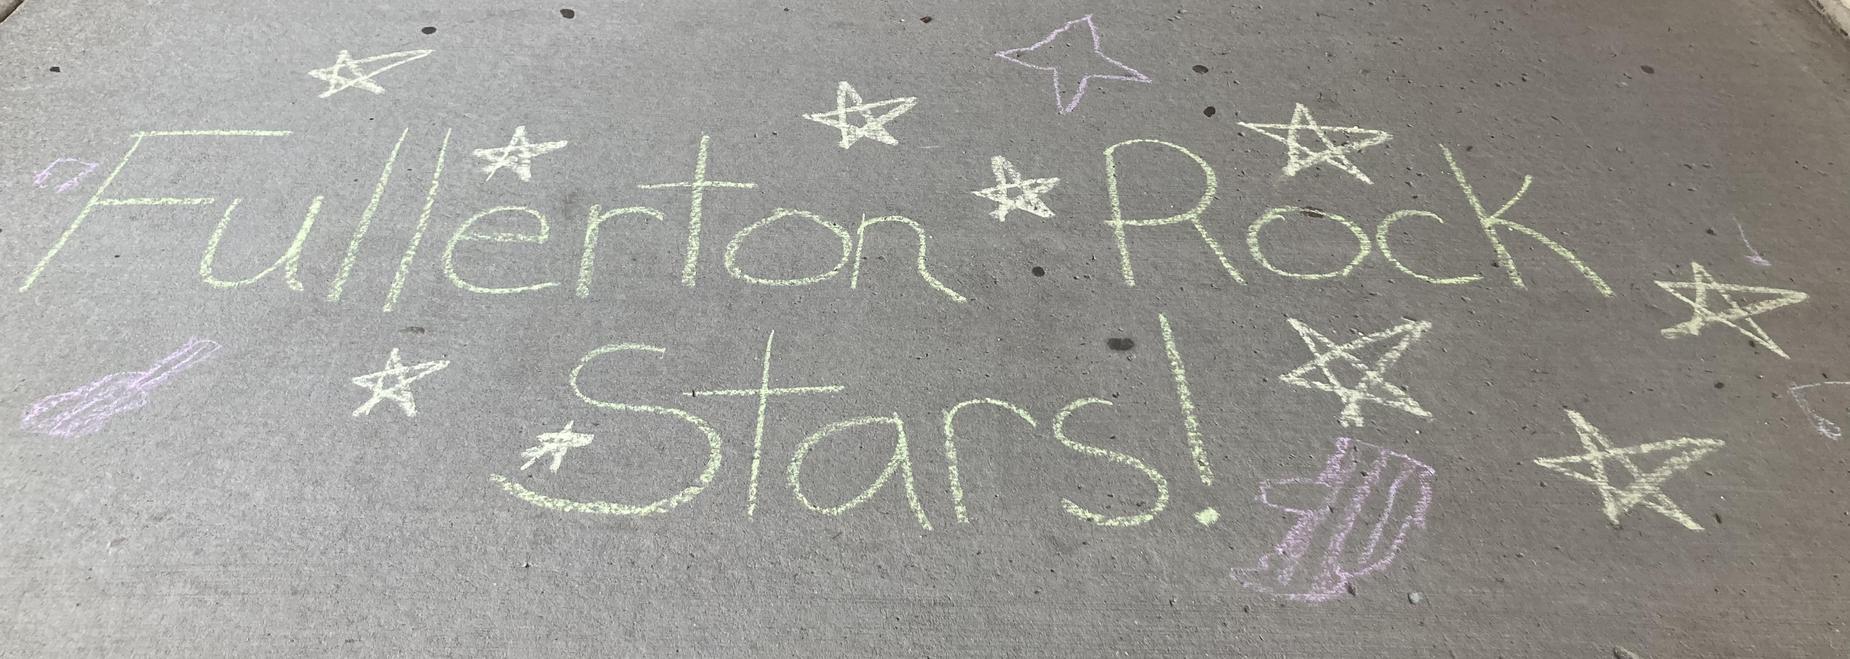 Fullerton Rock Stars